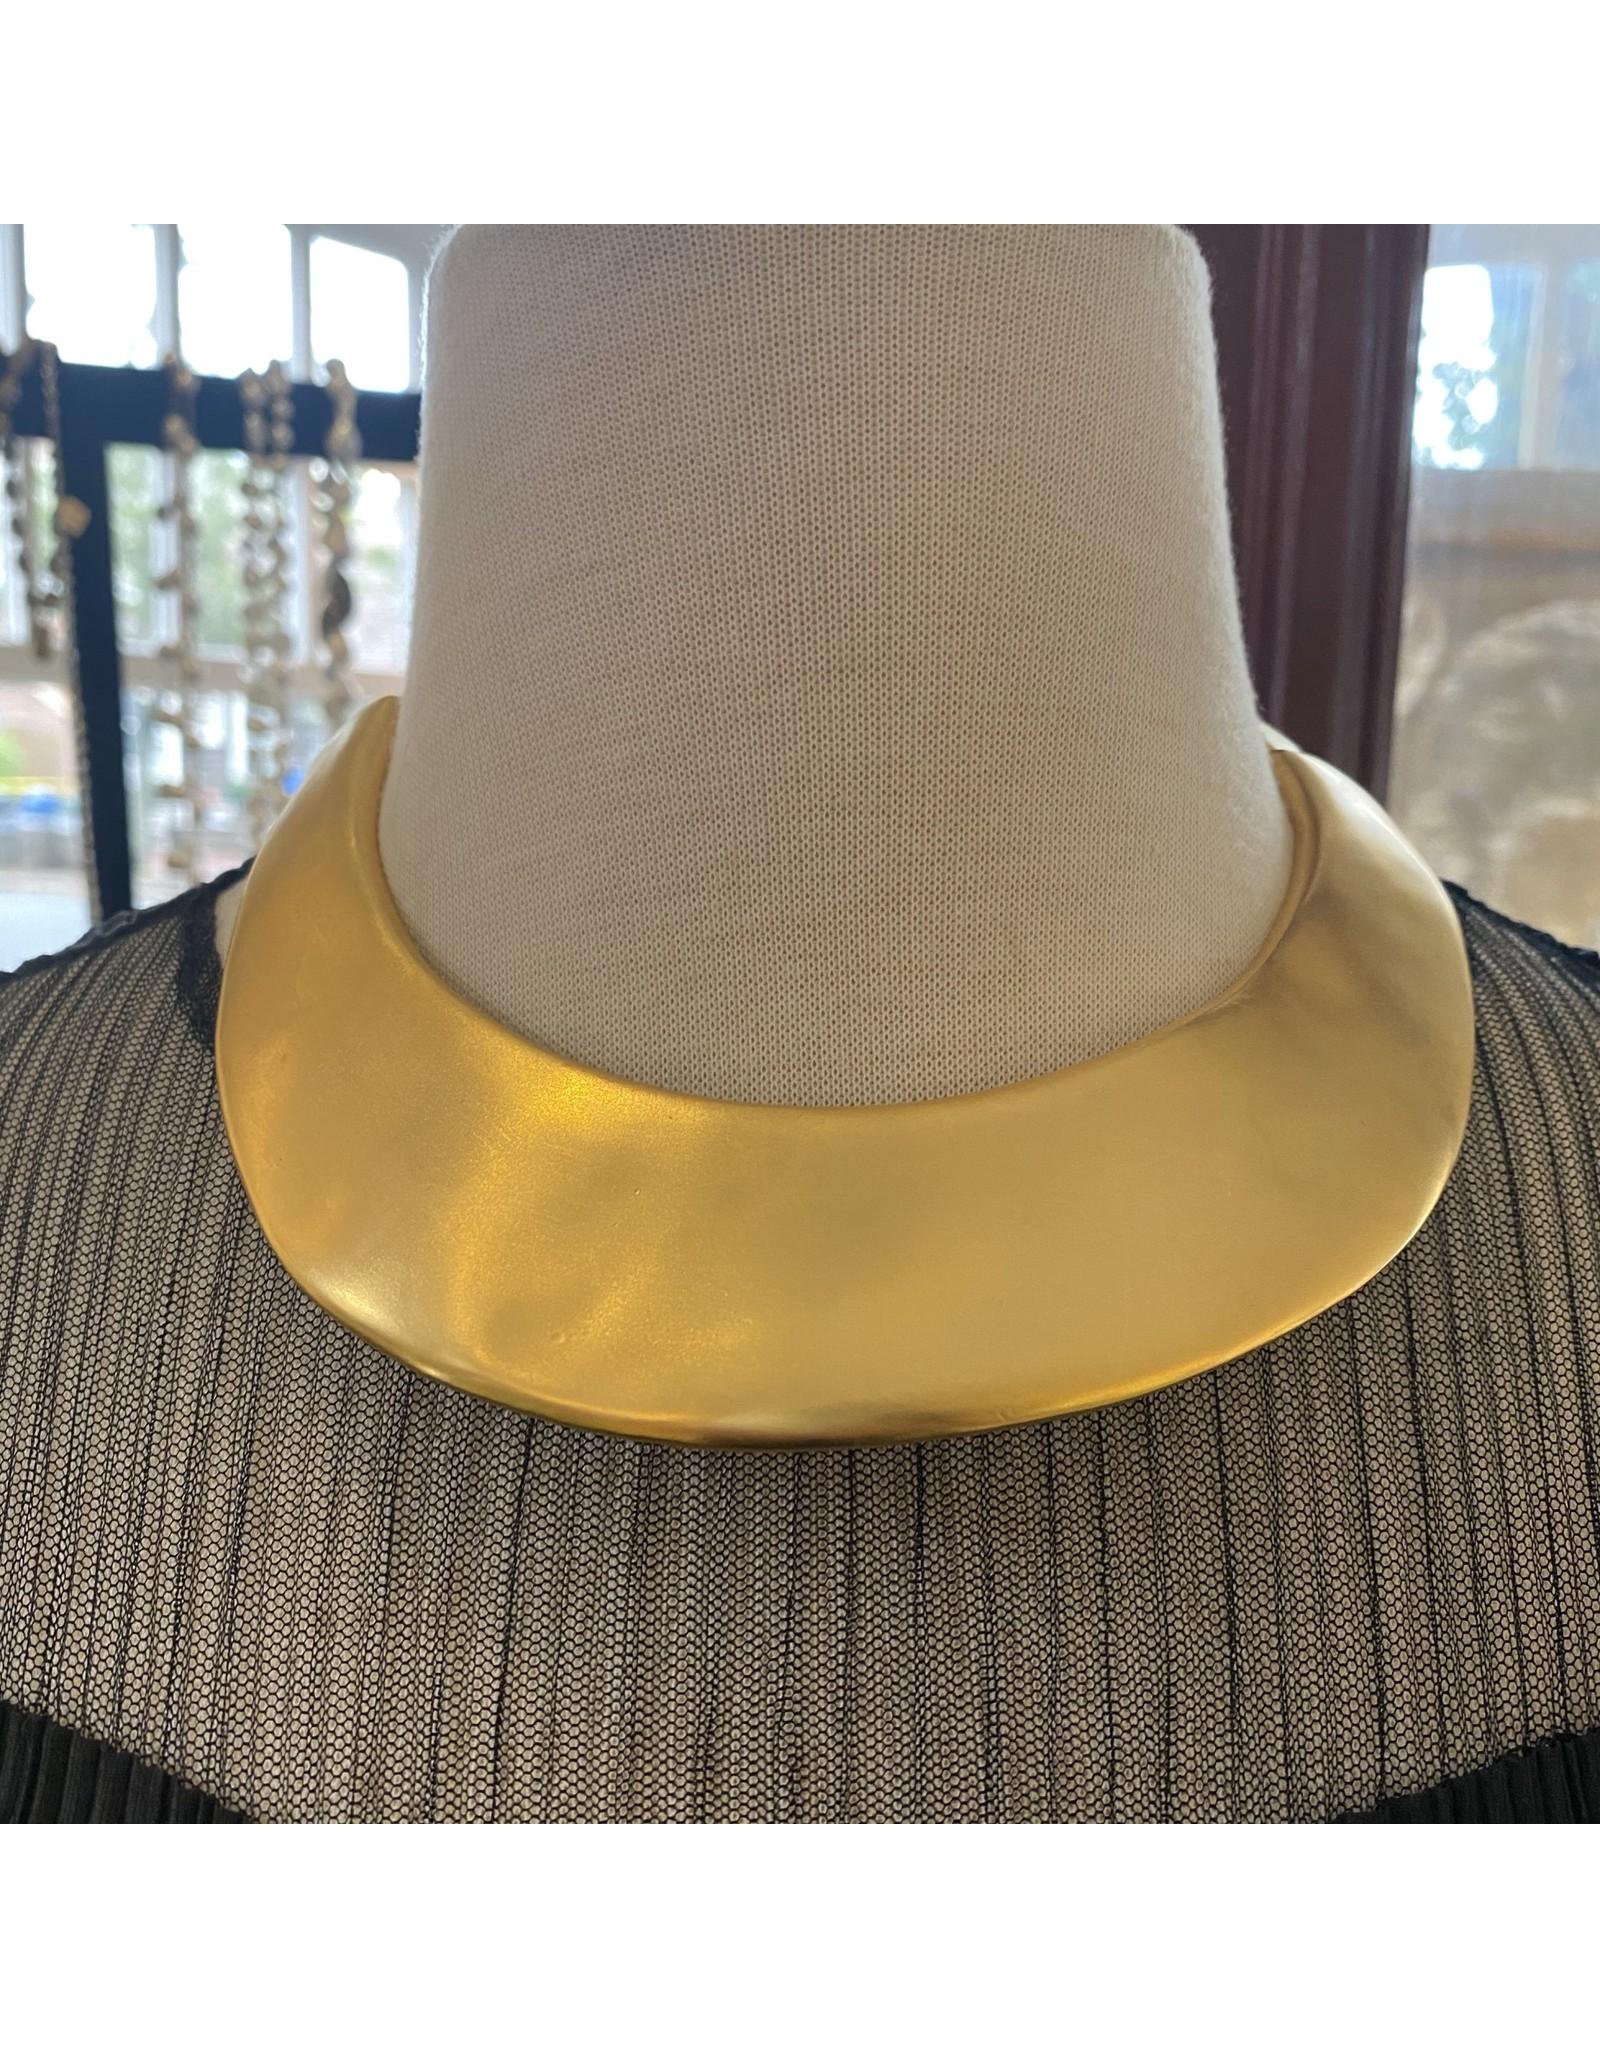 Kenneth Jay Lane Satin Gold Collar